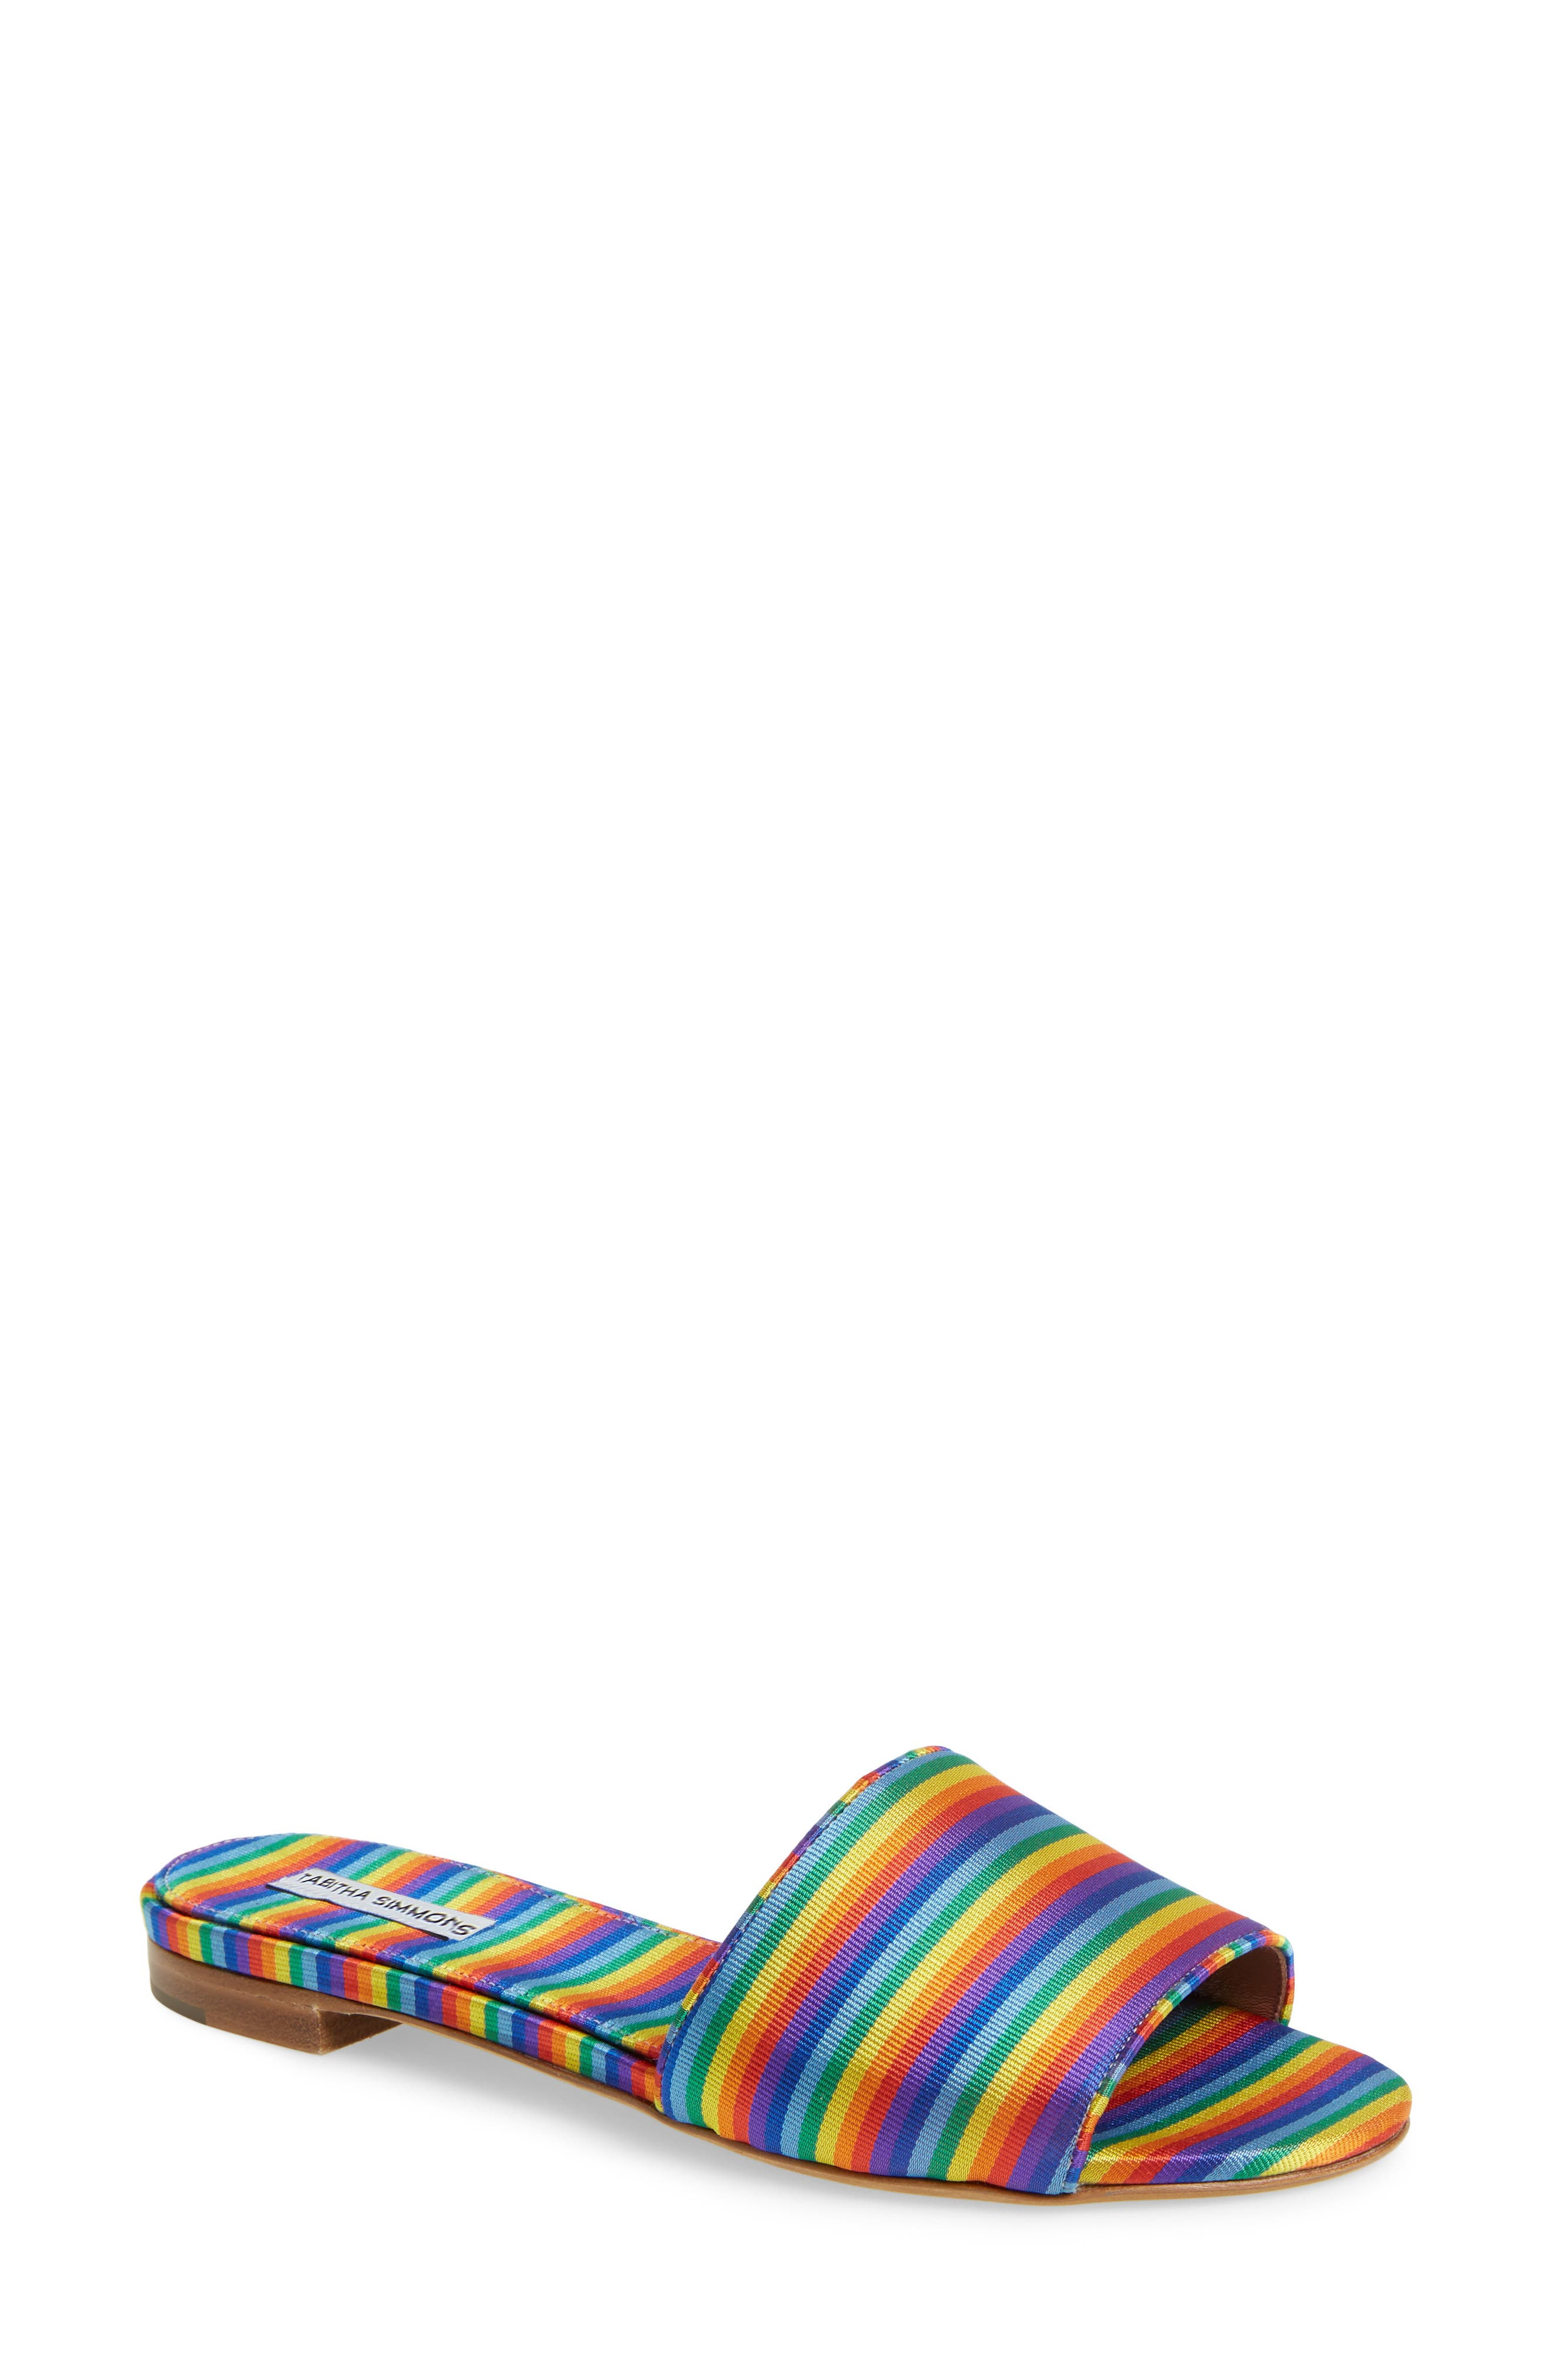 Sprinkles Slide Sandal,                         Main,                         color, Rainbow